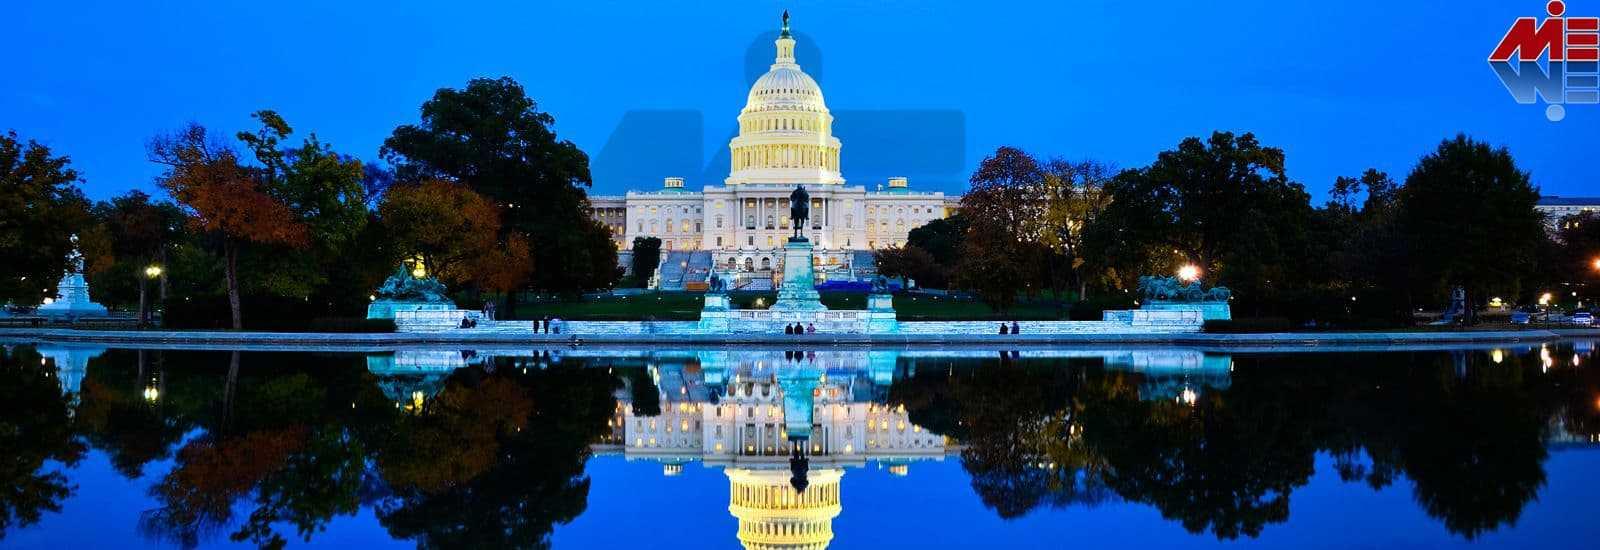 United States سرمایه گذاری در آمریکا